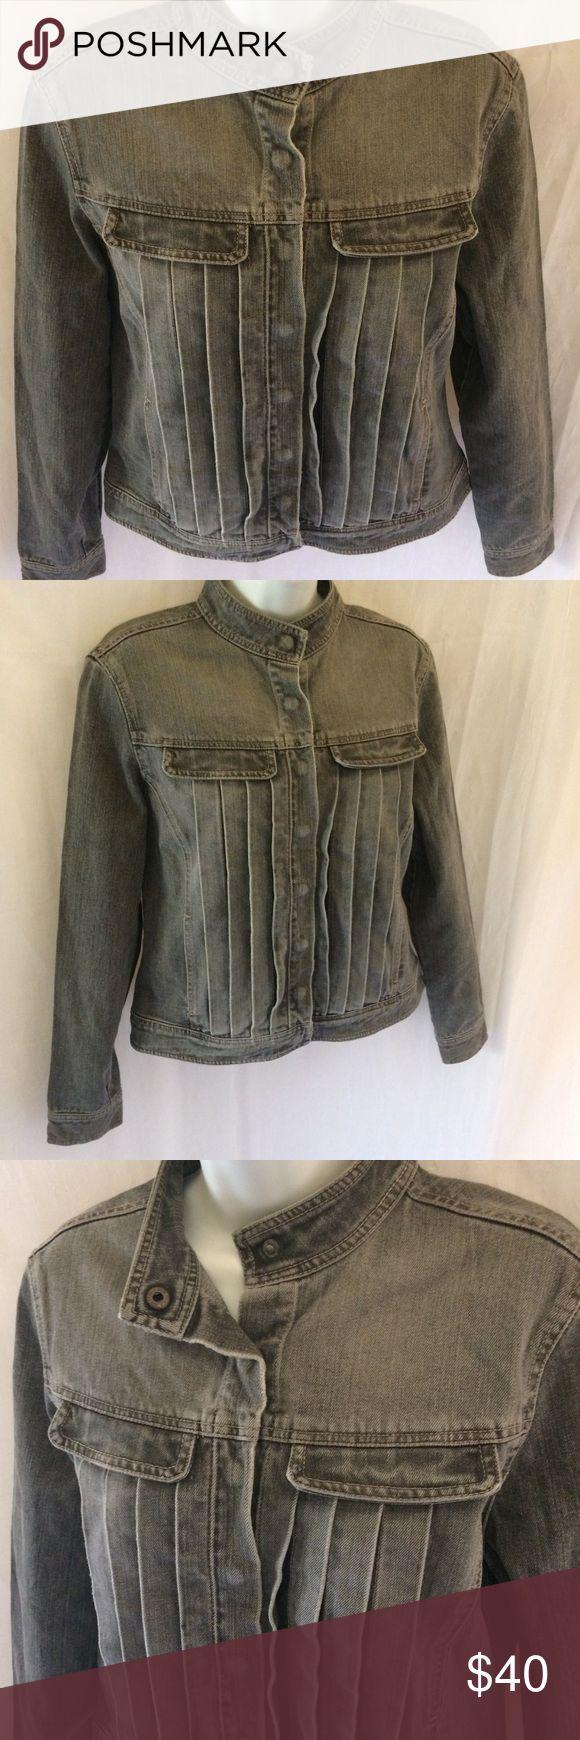 I just added this listing on Poshmark: French Connection Jean Jacket. #shopmycloset #poshmark #fashion #shopping #style #forsale #French Connection #Jackets & Blazers